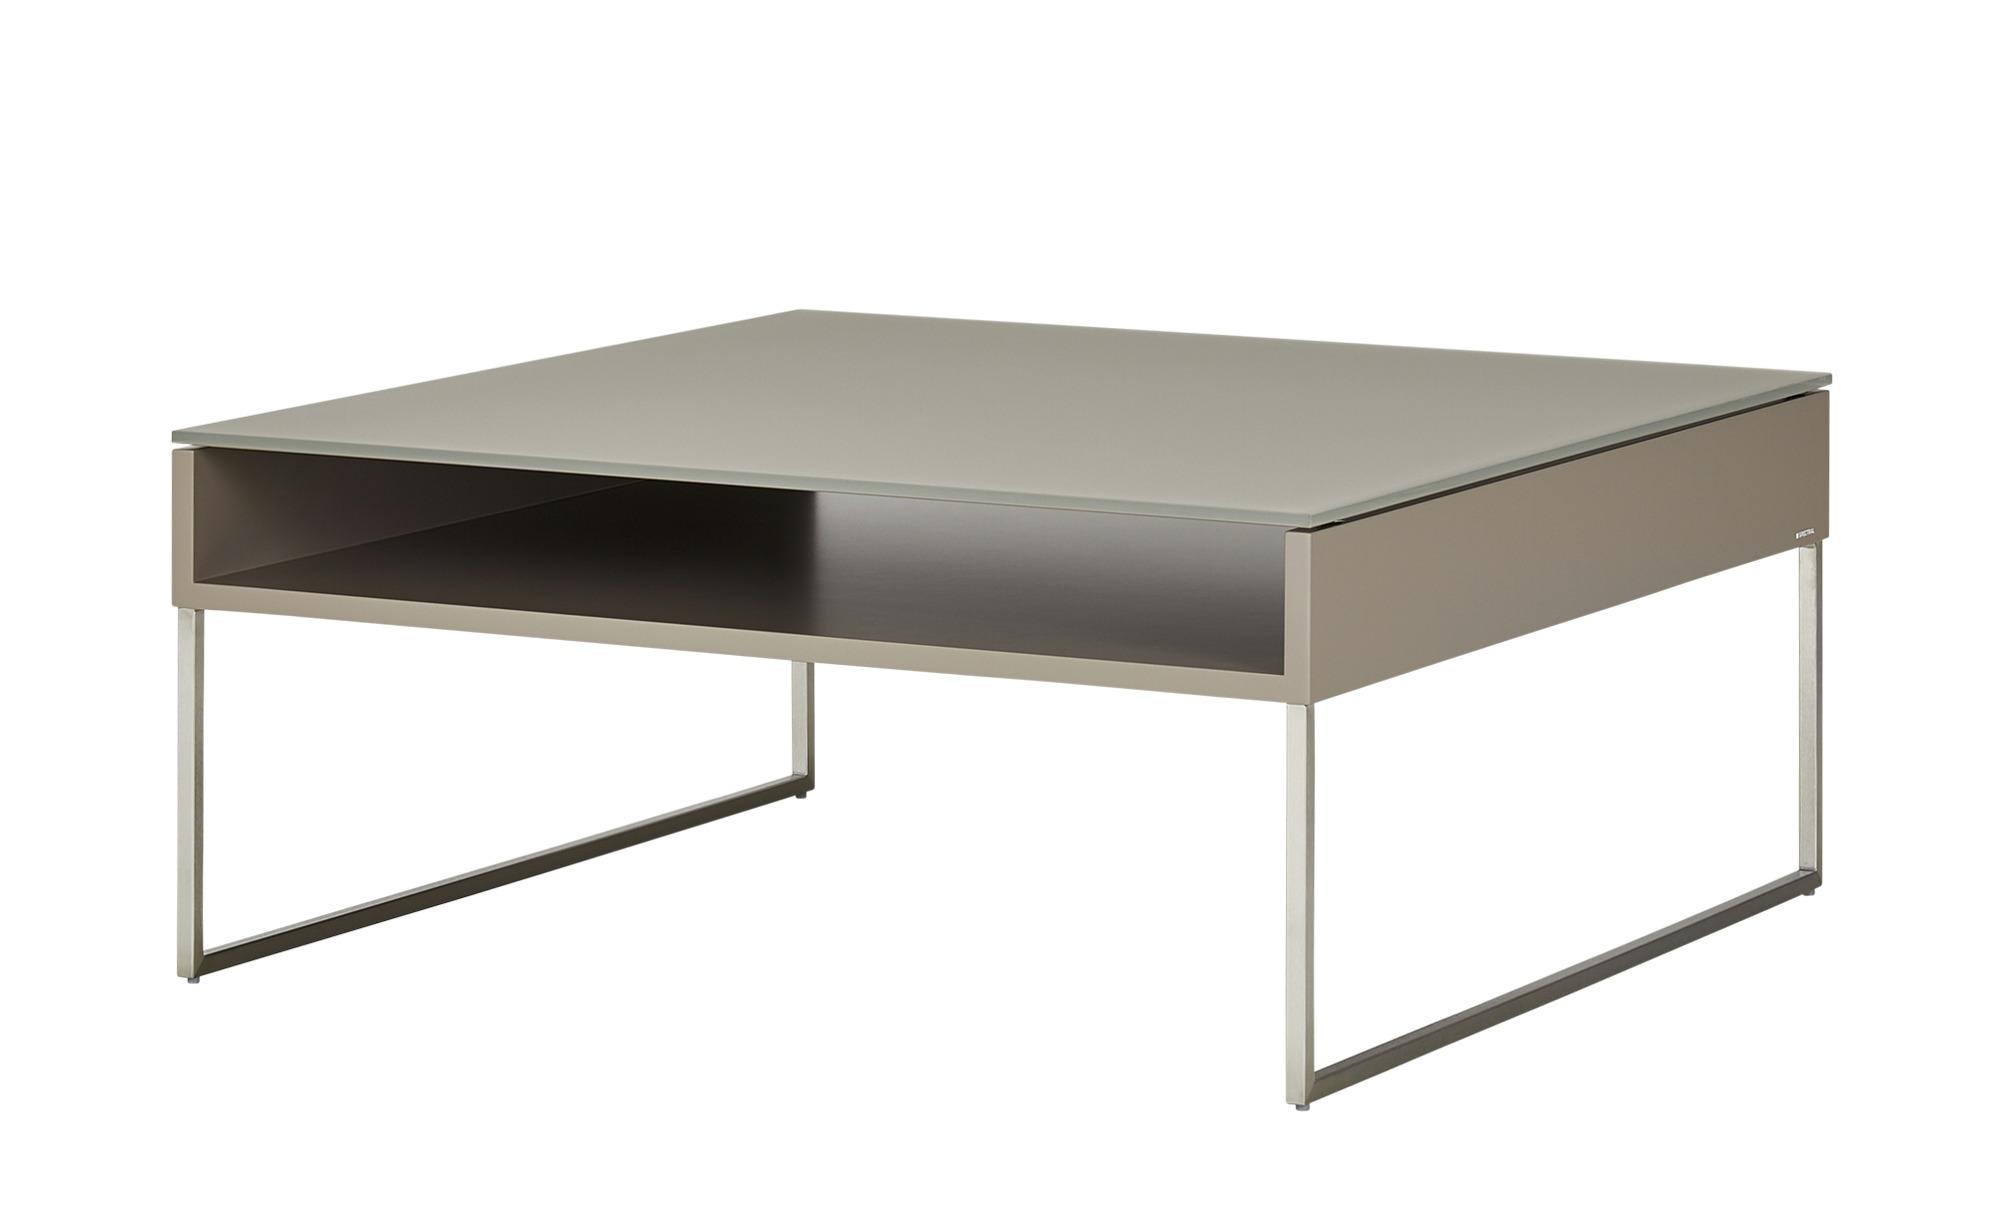 SPECTRAL Couchtisch  Tables ¦ Maße (cm): B: 90 H: 40 T: 90 Tische > Couchtische > Couchtische rechteckig - Höffner